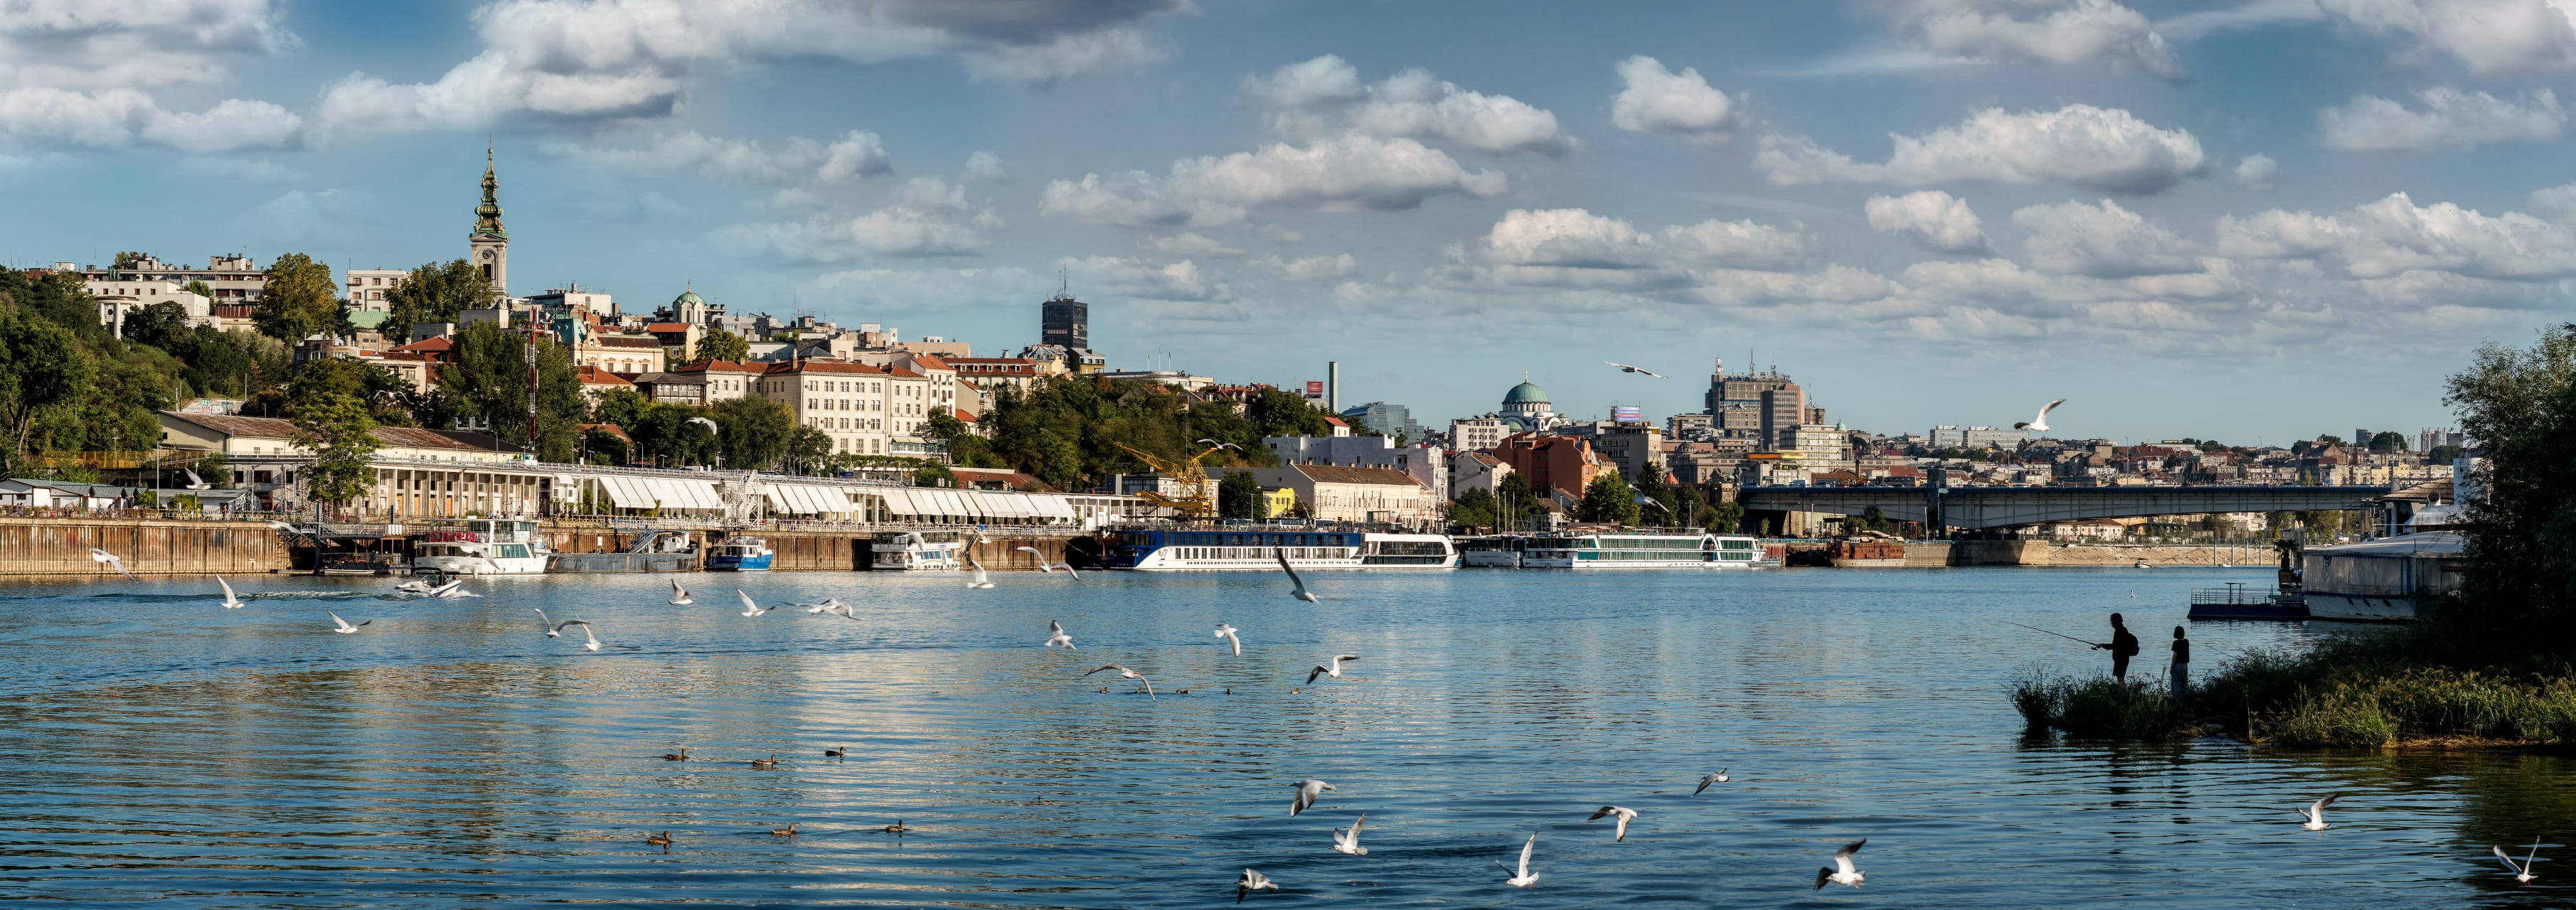 Belgrade cover image